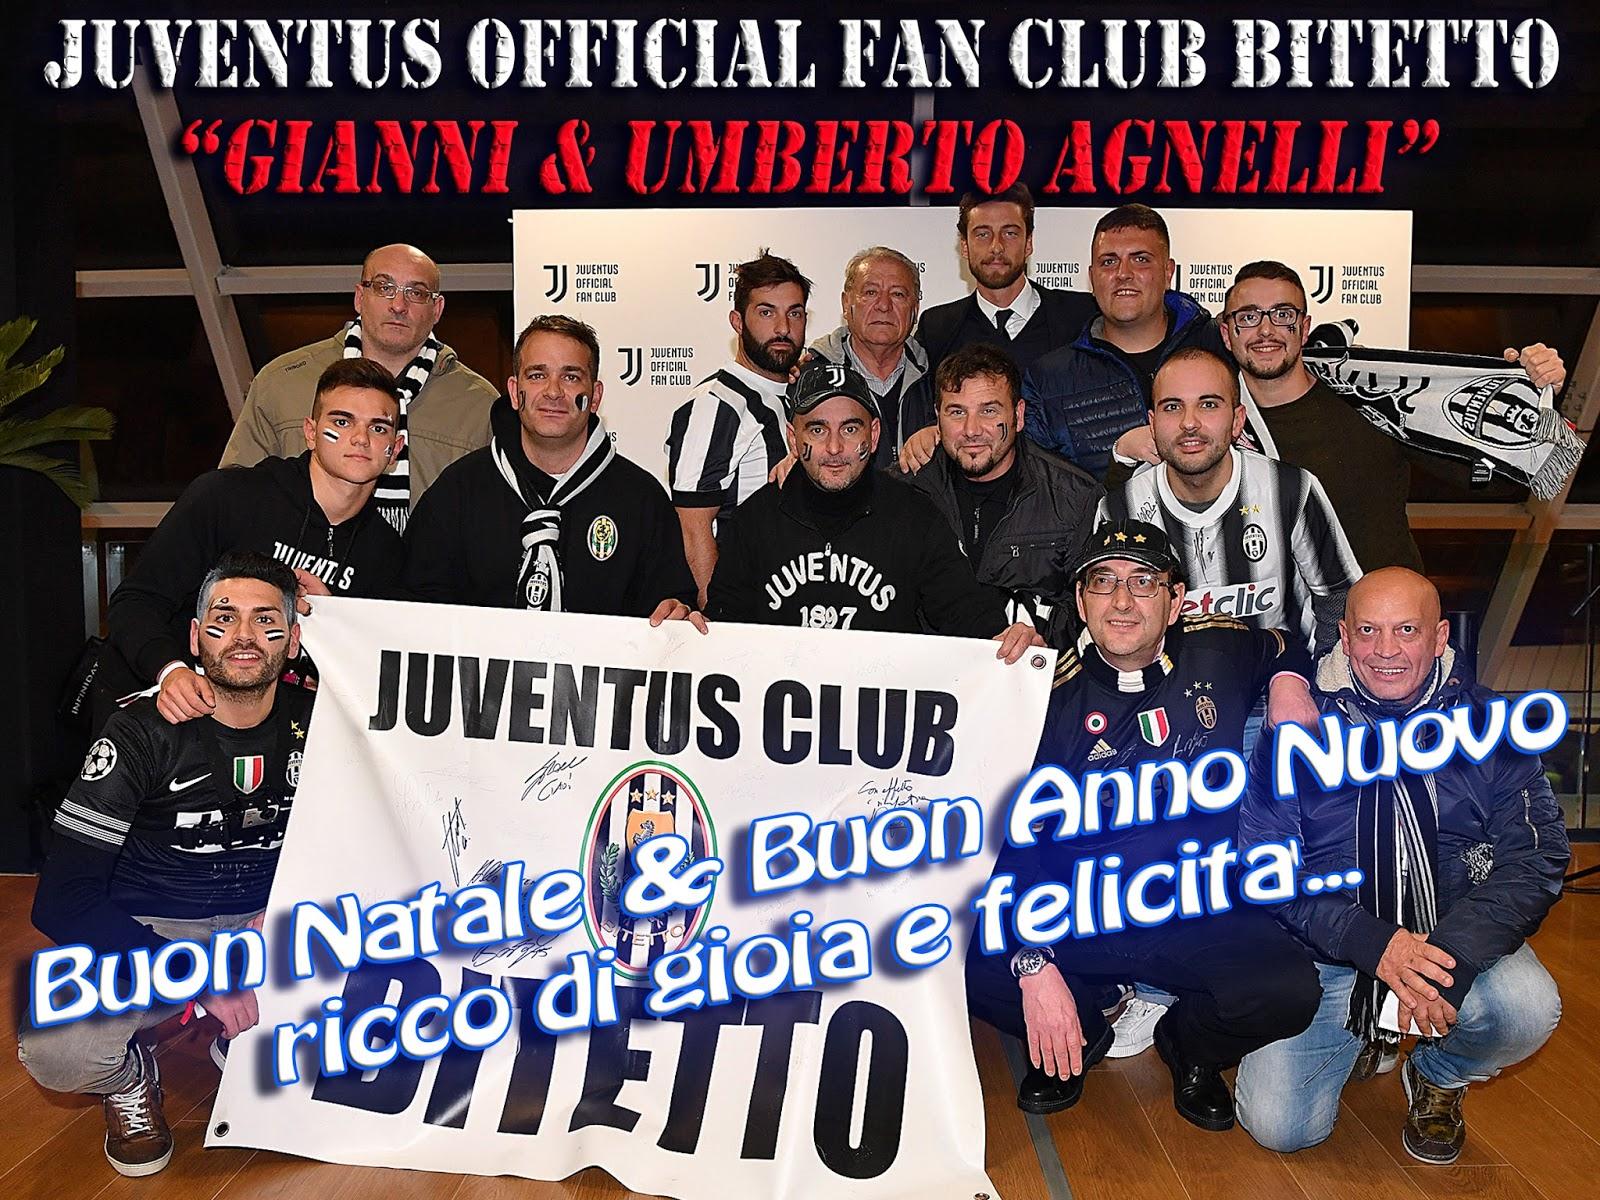 Auguri Di Buon Natale Juve.Juventus Official Fan Club Bitetto Gianni Umberto Agnelli Buon